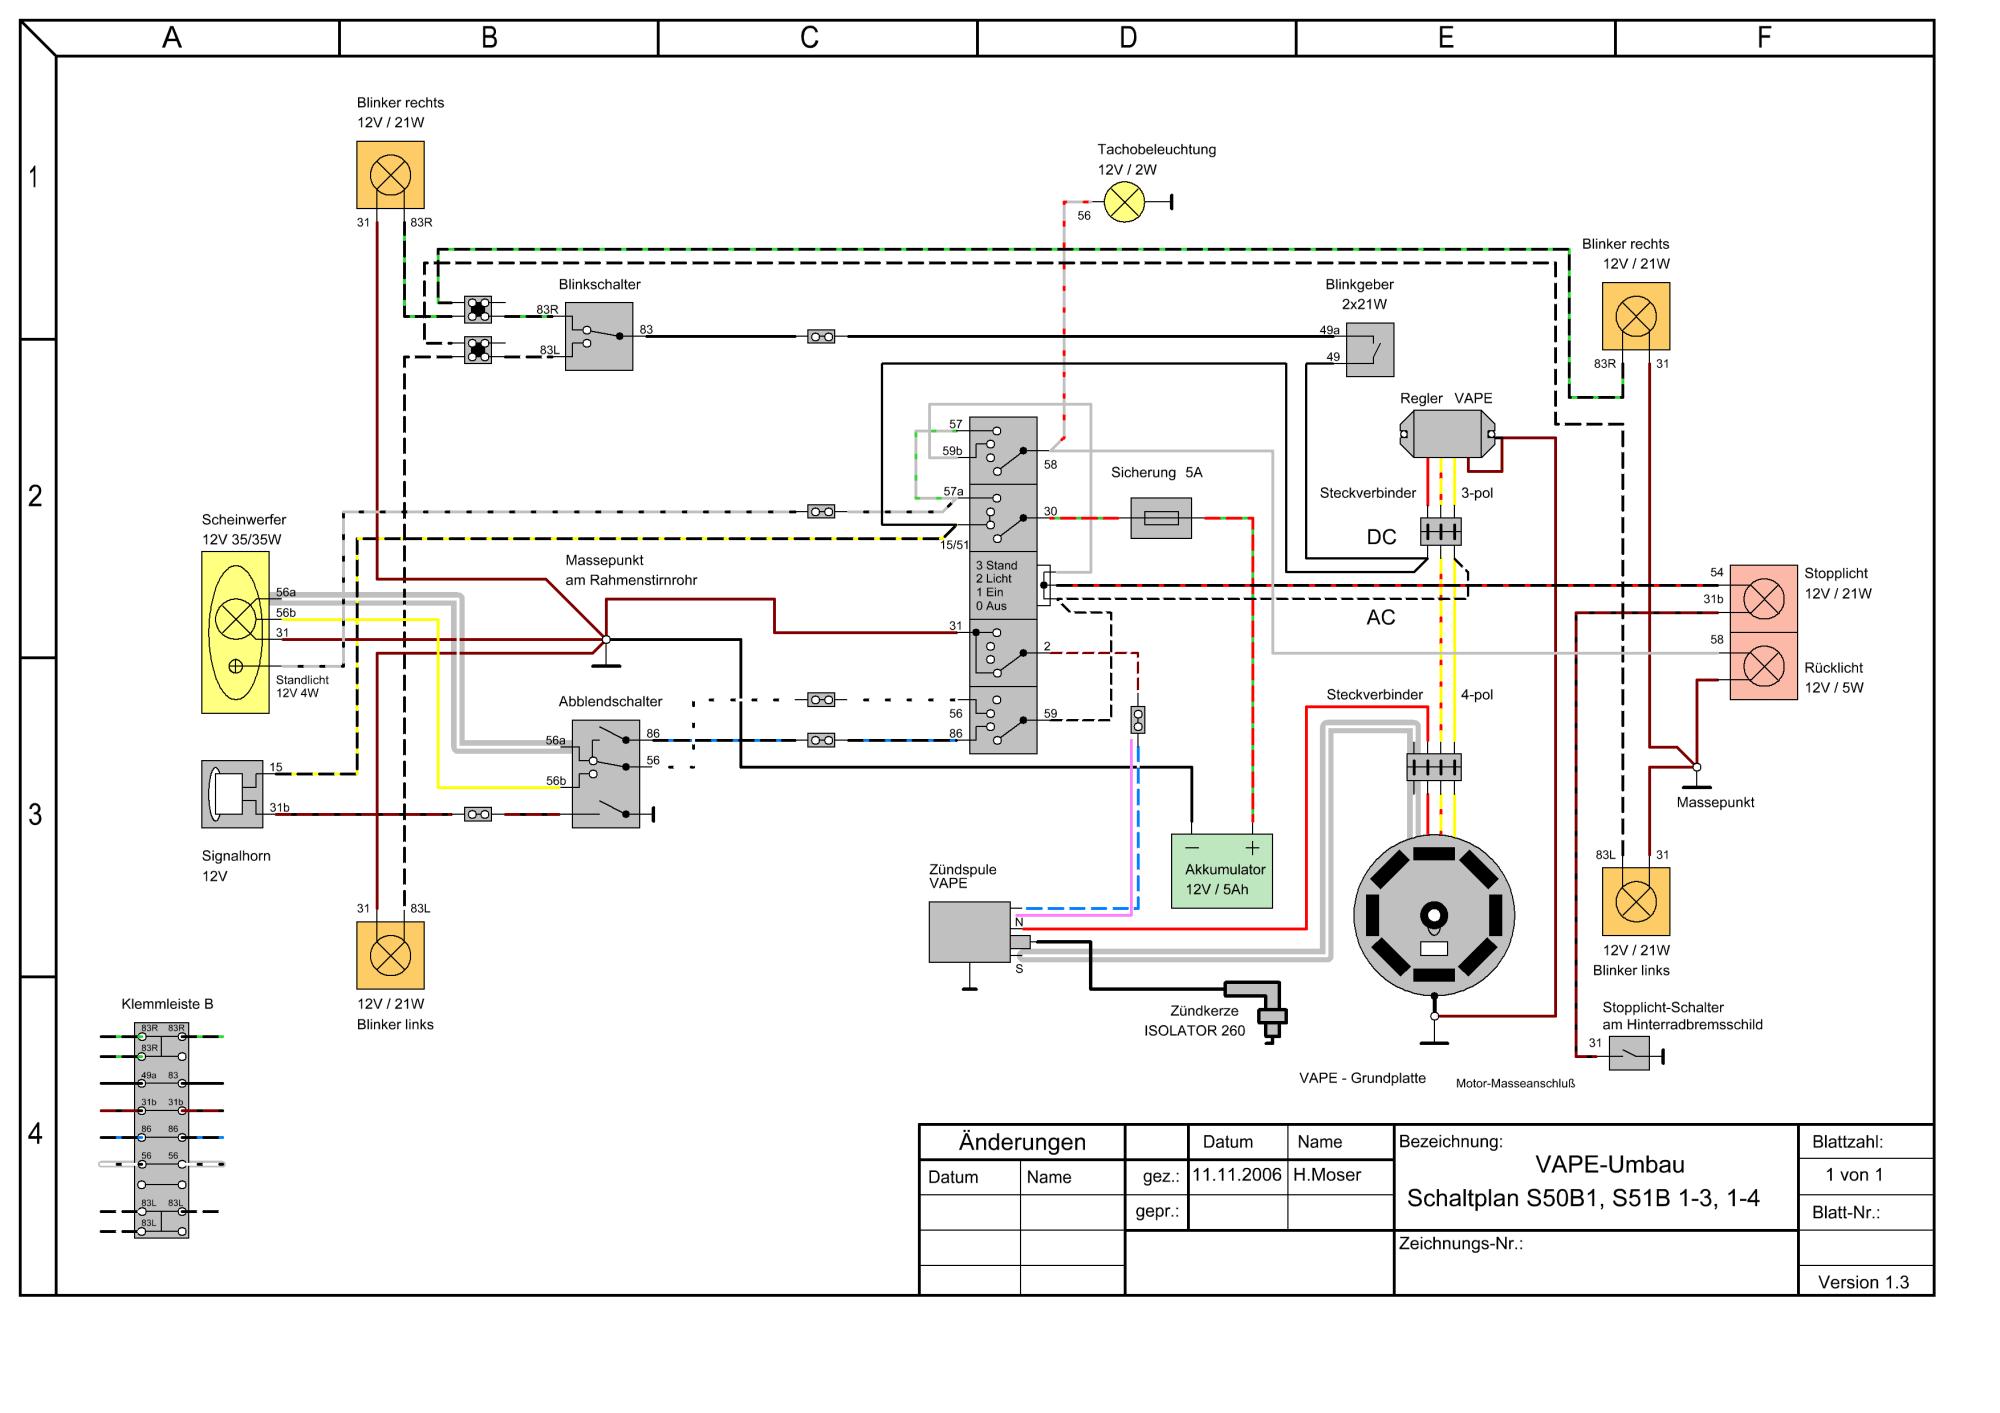 hight resolution of 4 wheeler solenoid wiring diagram 4 wheeler fuel pump 12v winch solenoid wiring diagram rocker switch wiring diagram